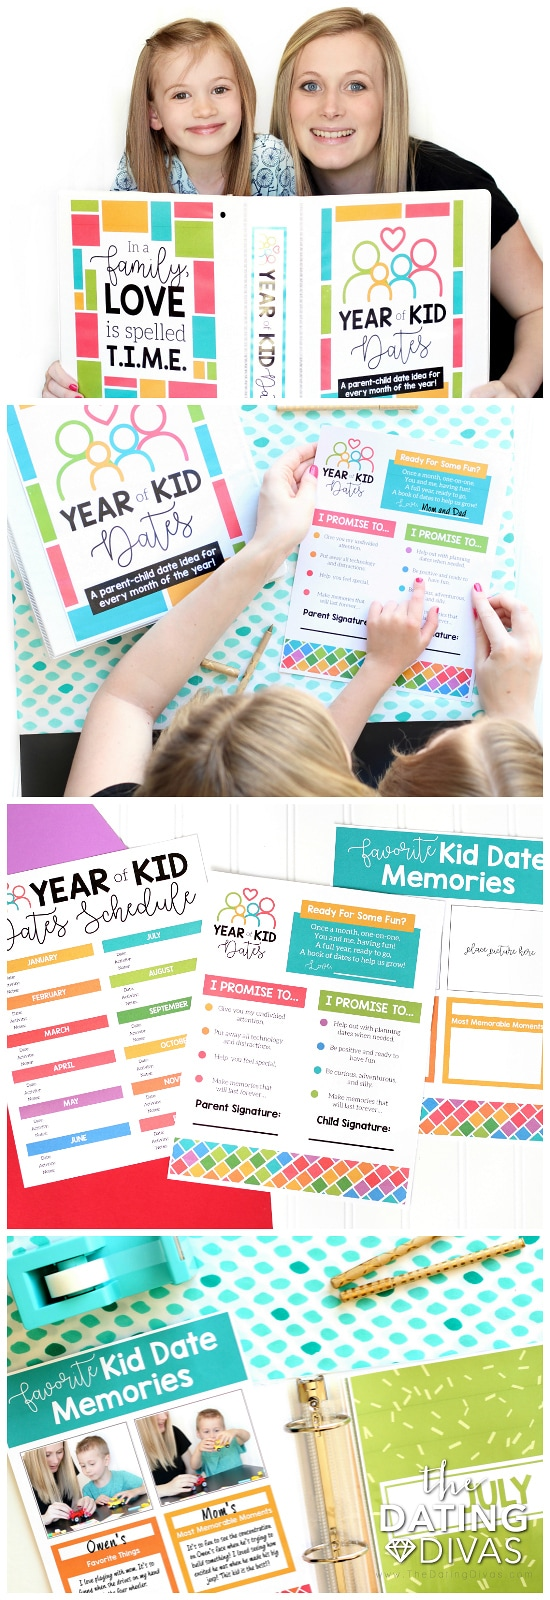 Year of Kid Date Ideas Binder